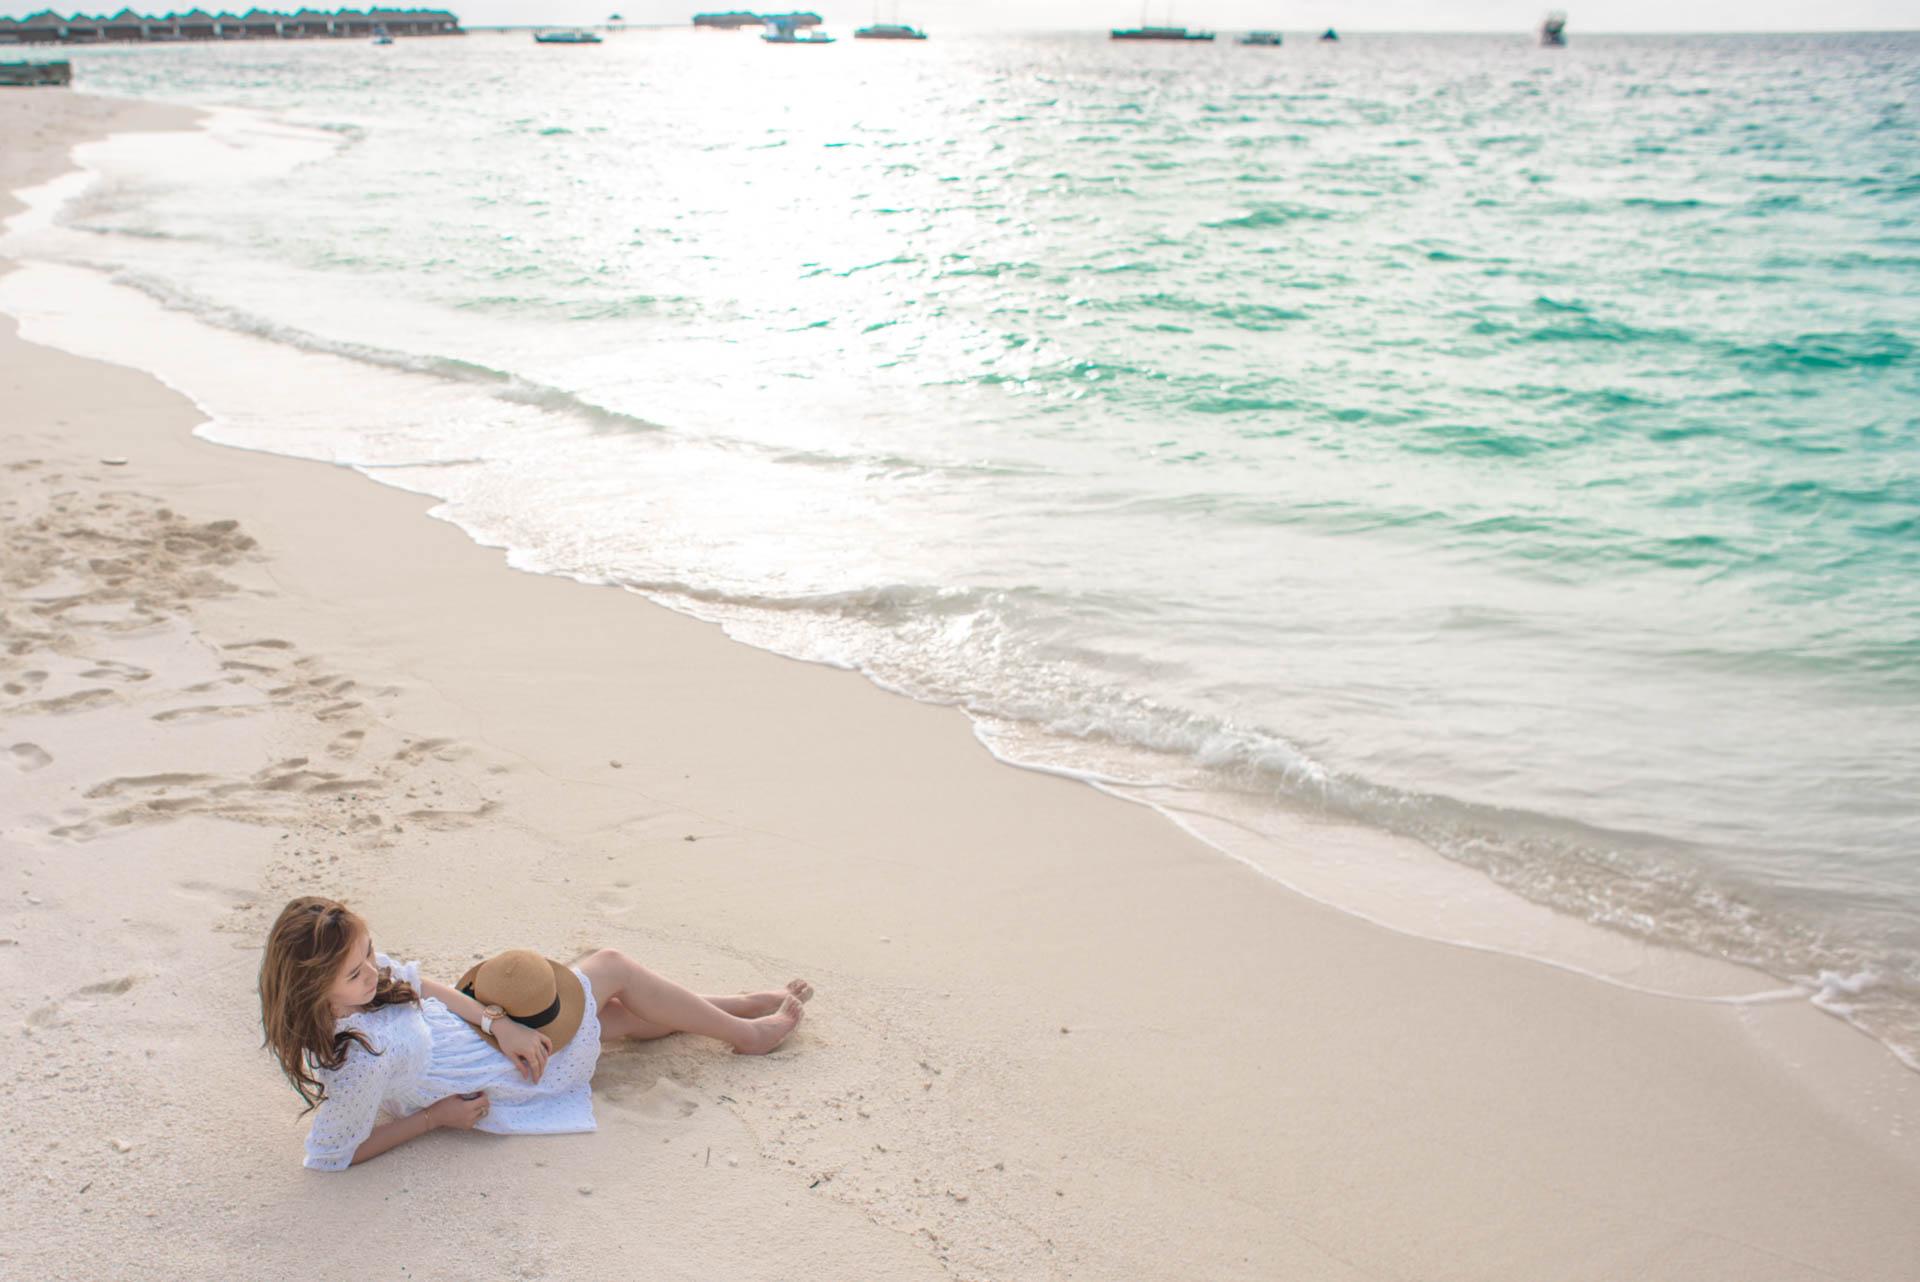 Chin Siew and Chin Yee Honeymoon in Maldives at Huvafen Fushi Resort Under Water Spa 25